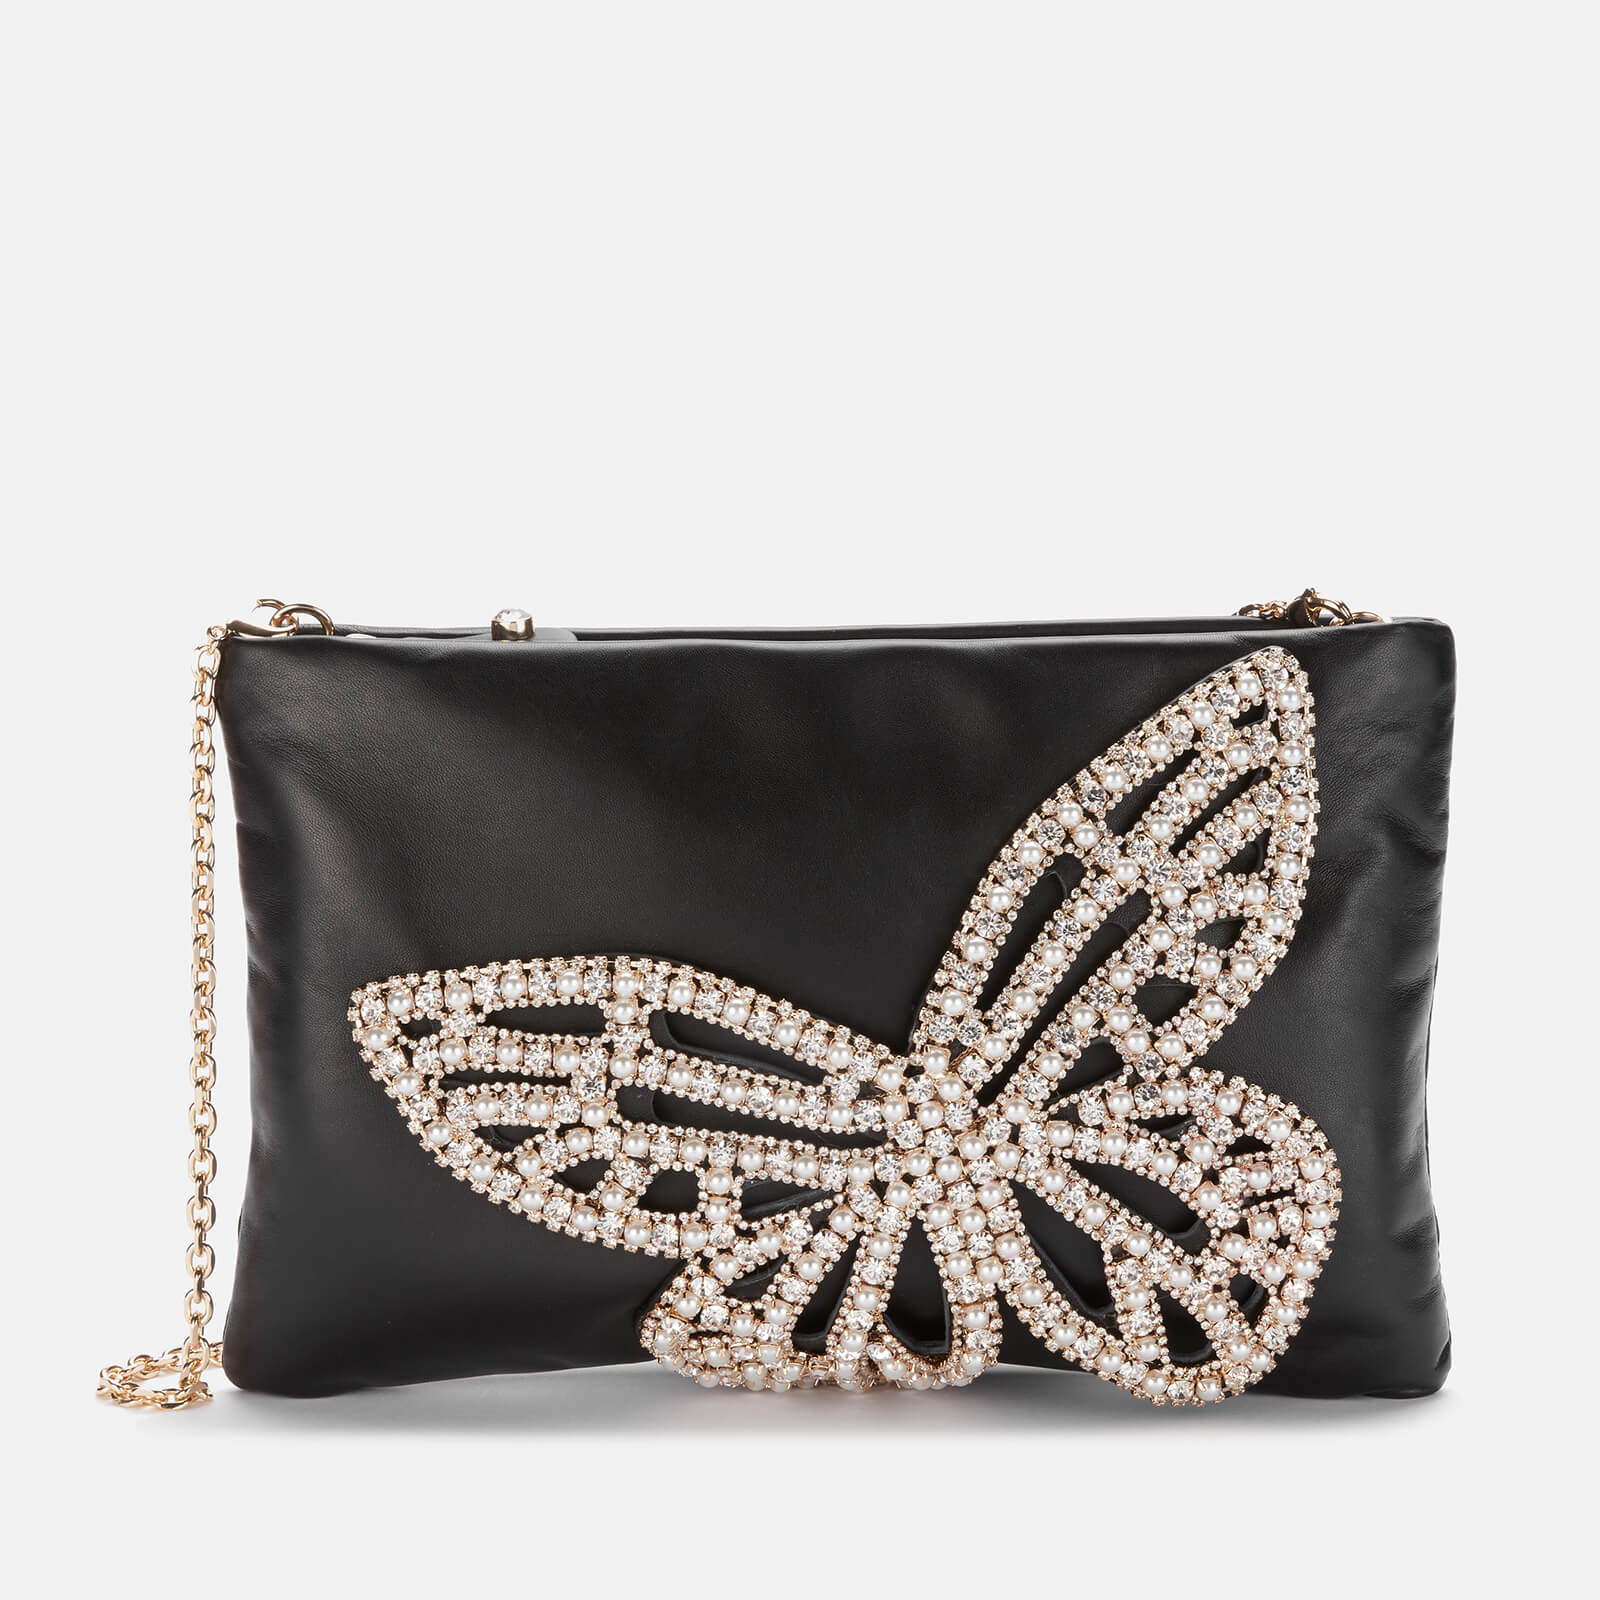 Sophia Webster Women's Flossy Crystal Clutch - Black & Pearl